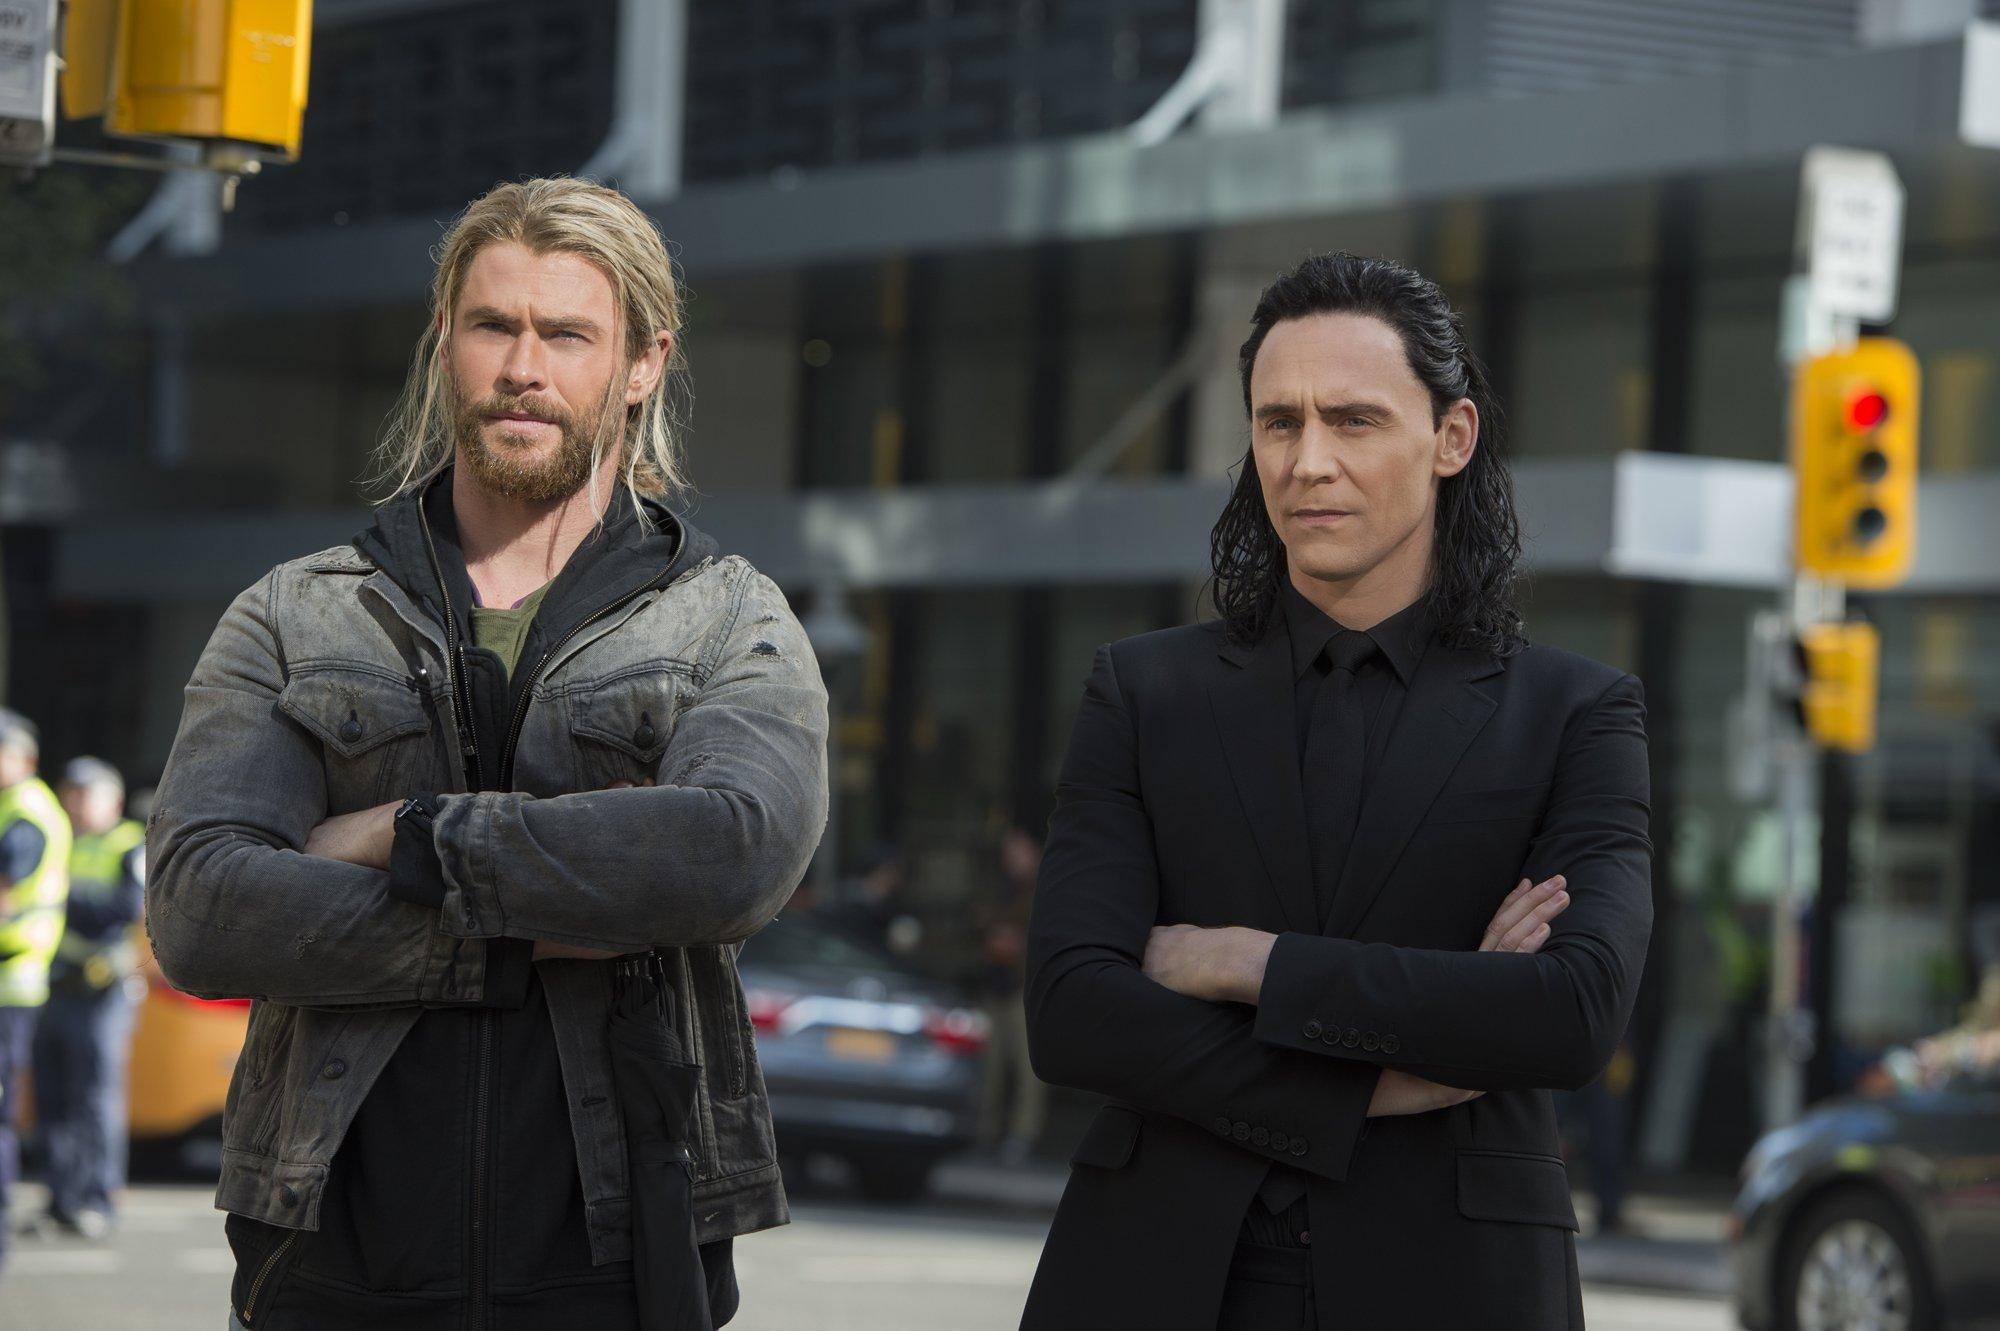 Photo du film Thor: Ragnarok avec Chris Hemsworth et Tom Hiddleston (Thor et Loki)